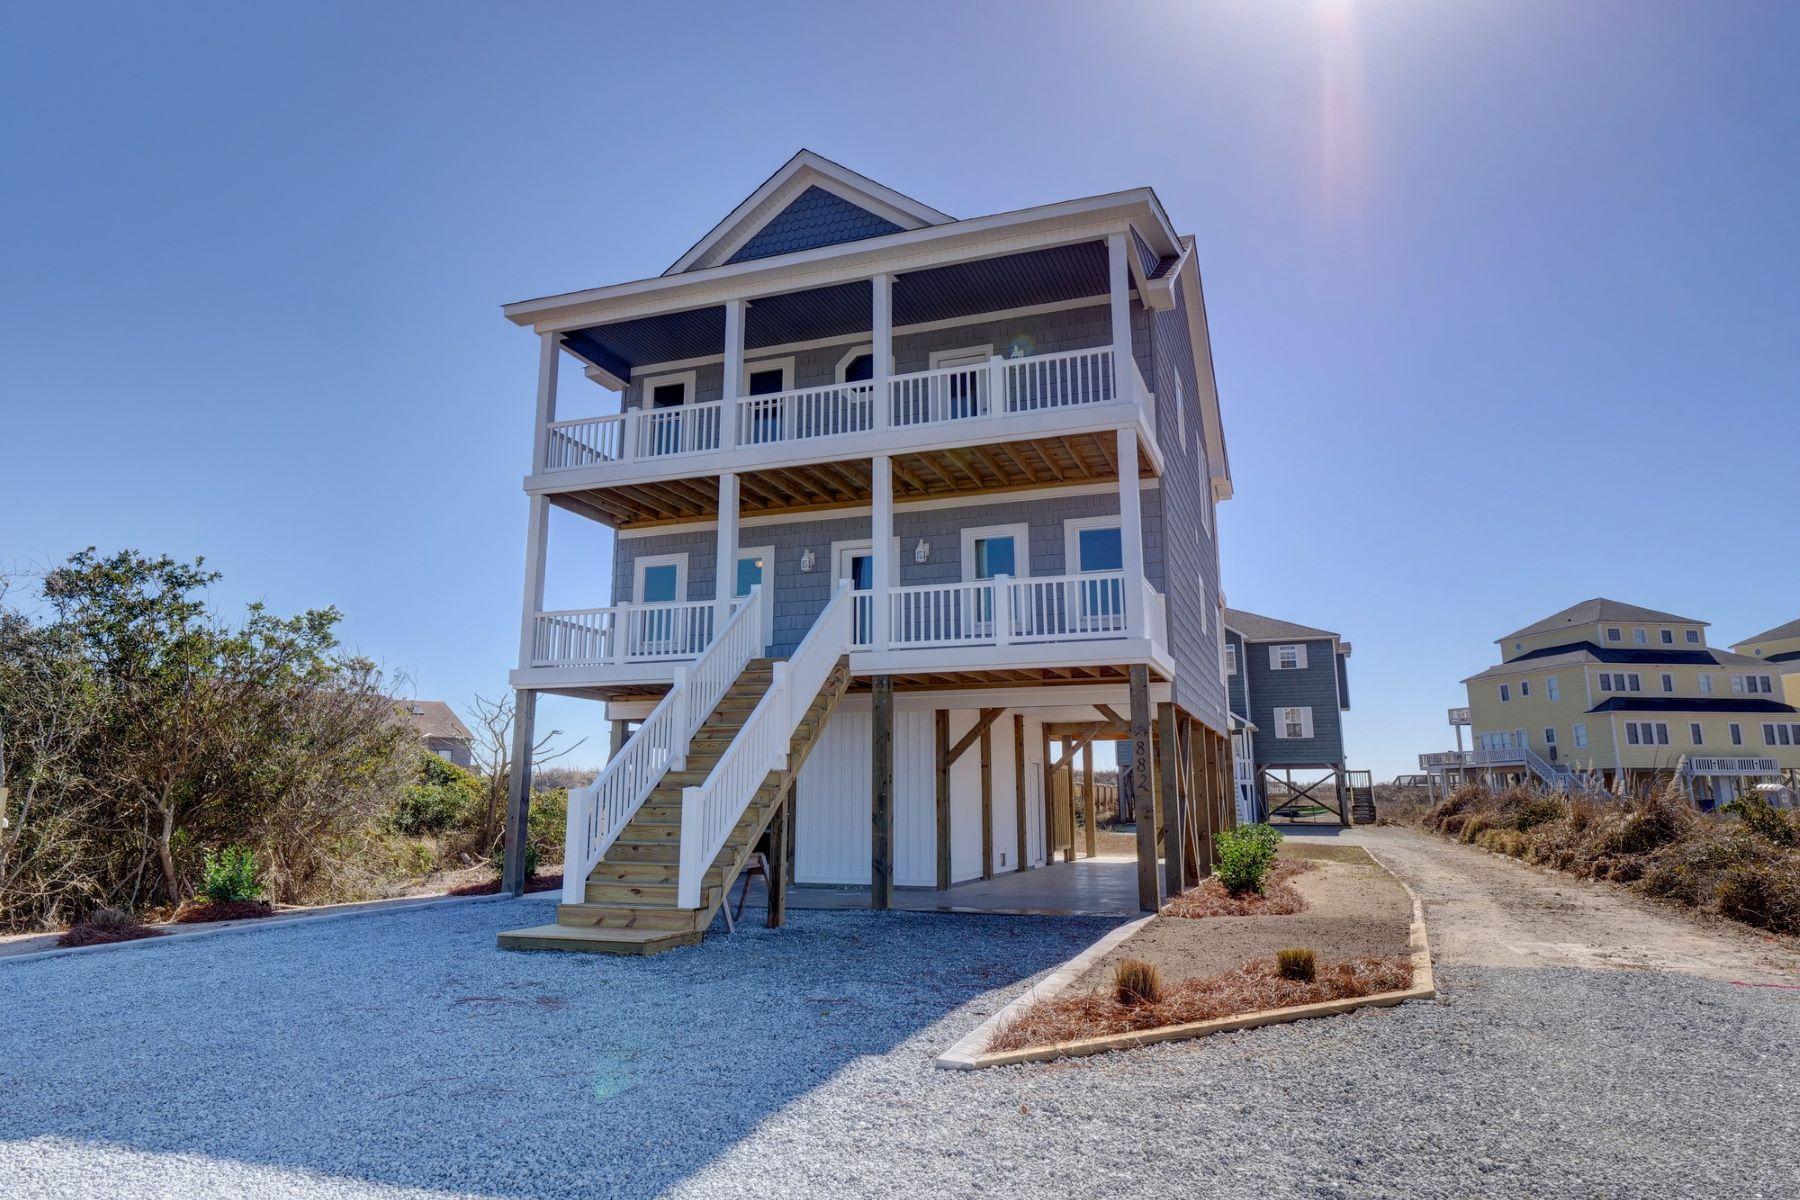 واحد منزل الأسرة للـ Sale في Brand New Spectacular Oceanfront Home 882 New River Inlet Road, N Topsail Beach, North Carolina, 28460 United States